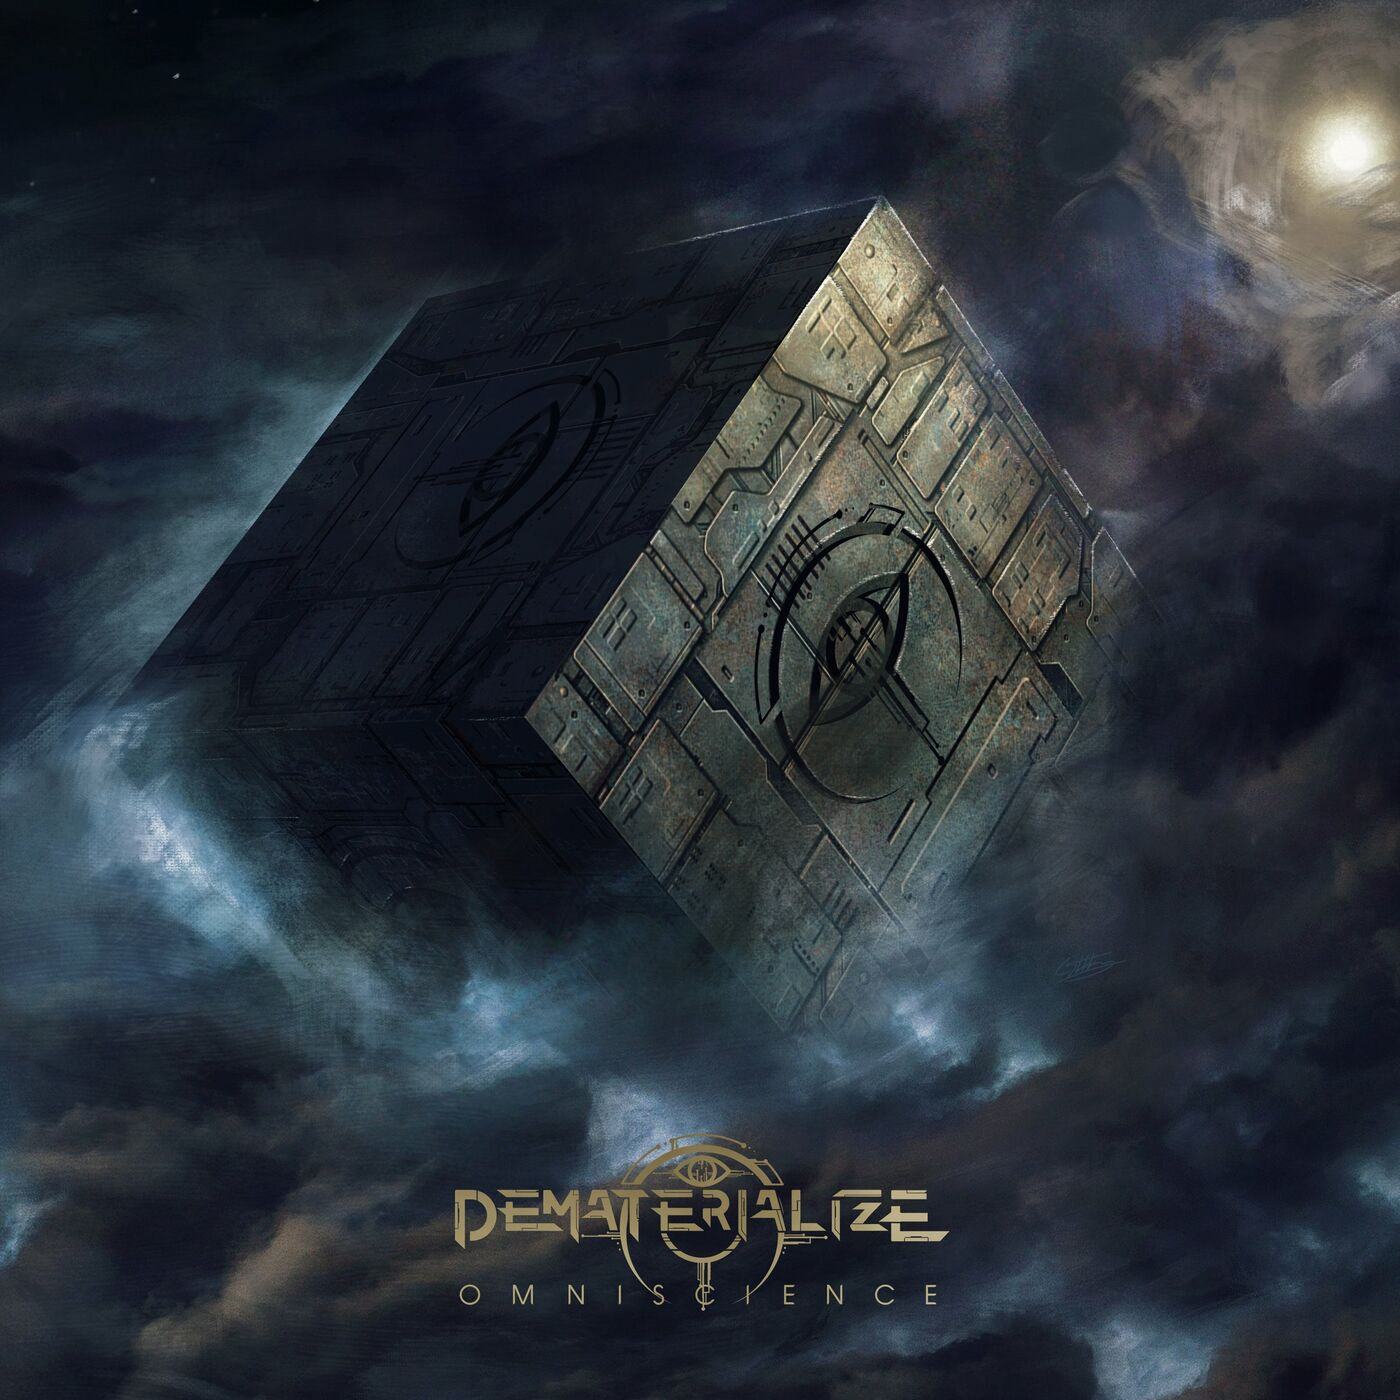 Dematerialize - Omniscience (2020)